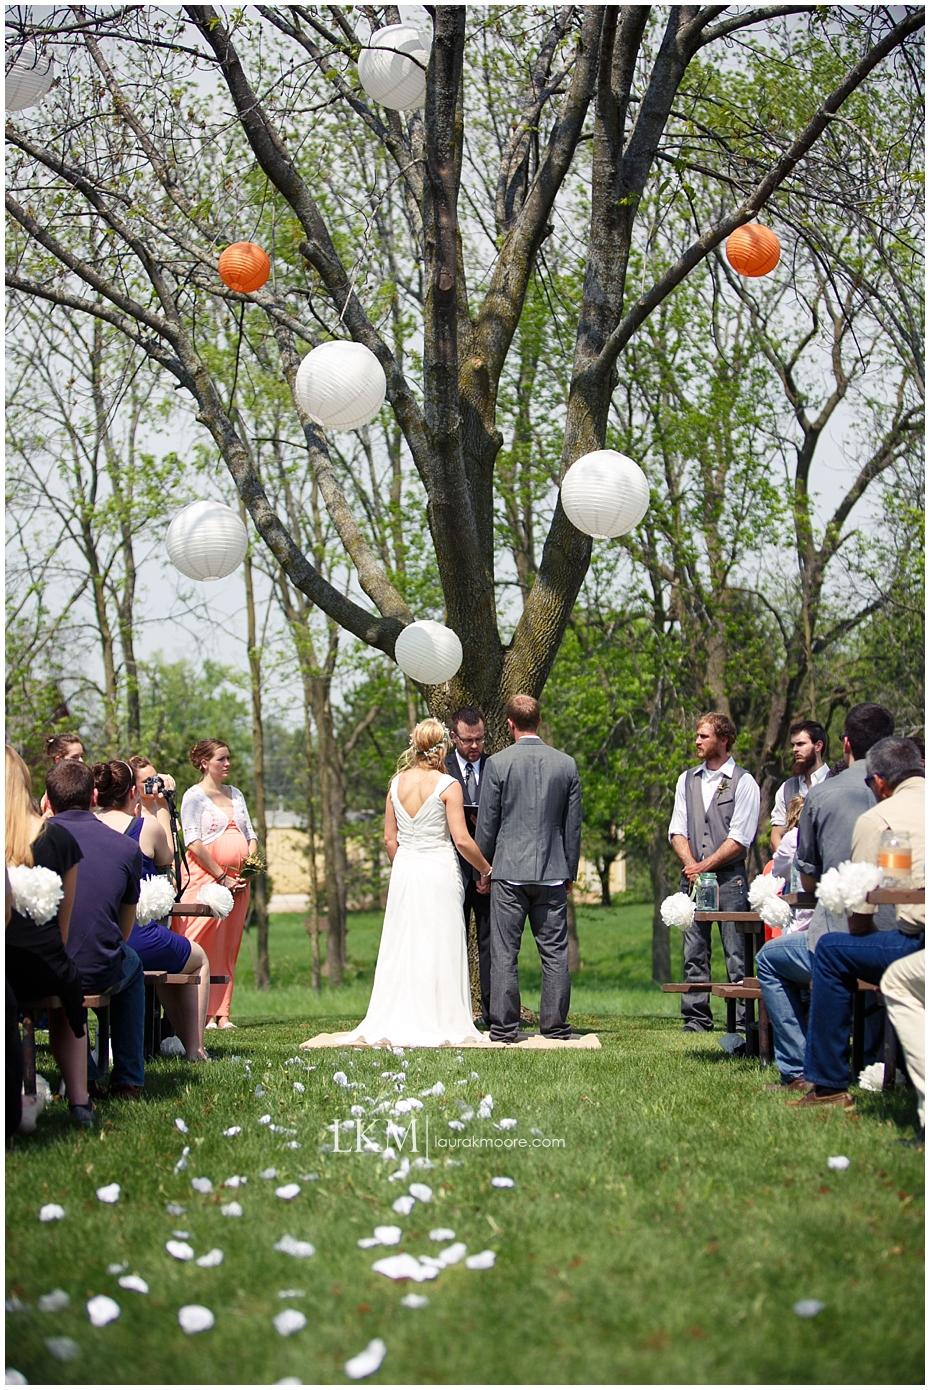 Milwaukee-Wedding-Photographer-Laura-K-Moore-KUHLOW_0064.jpg